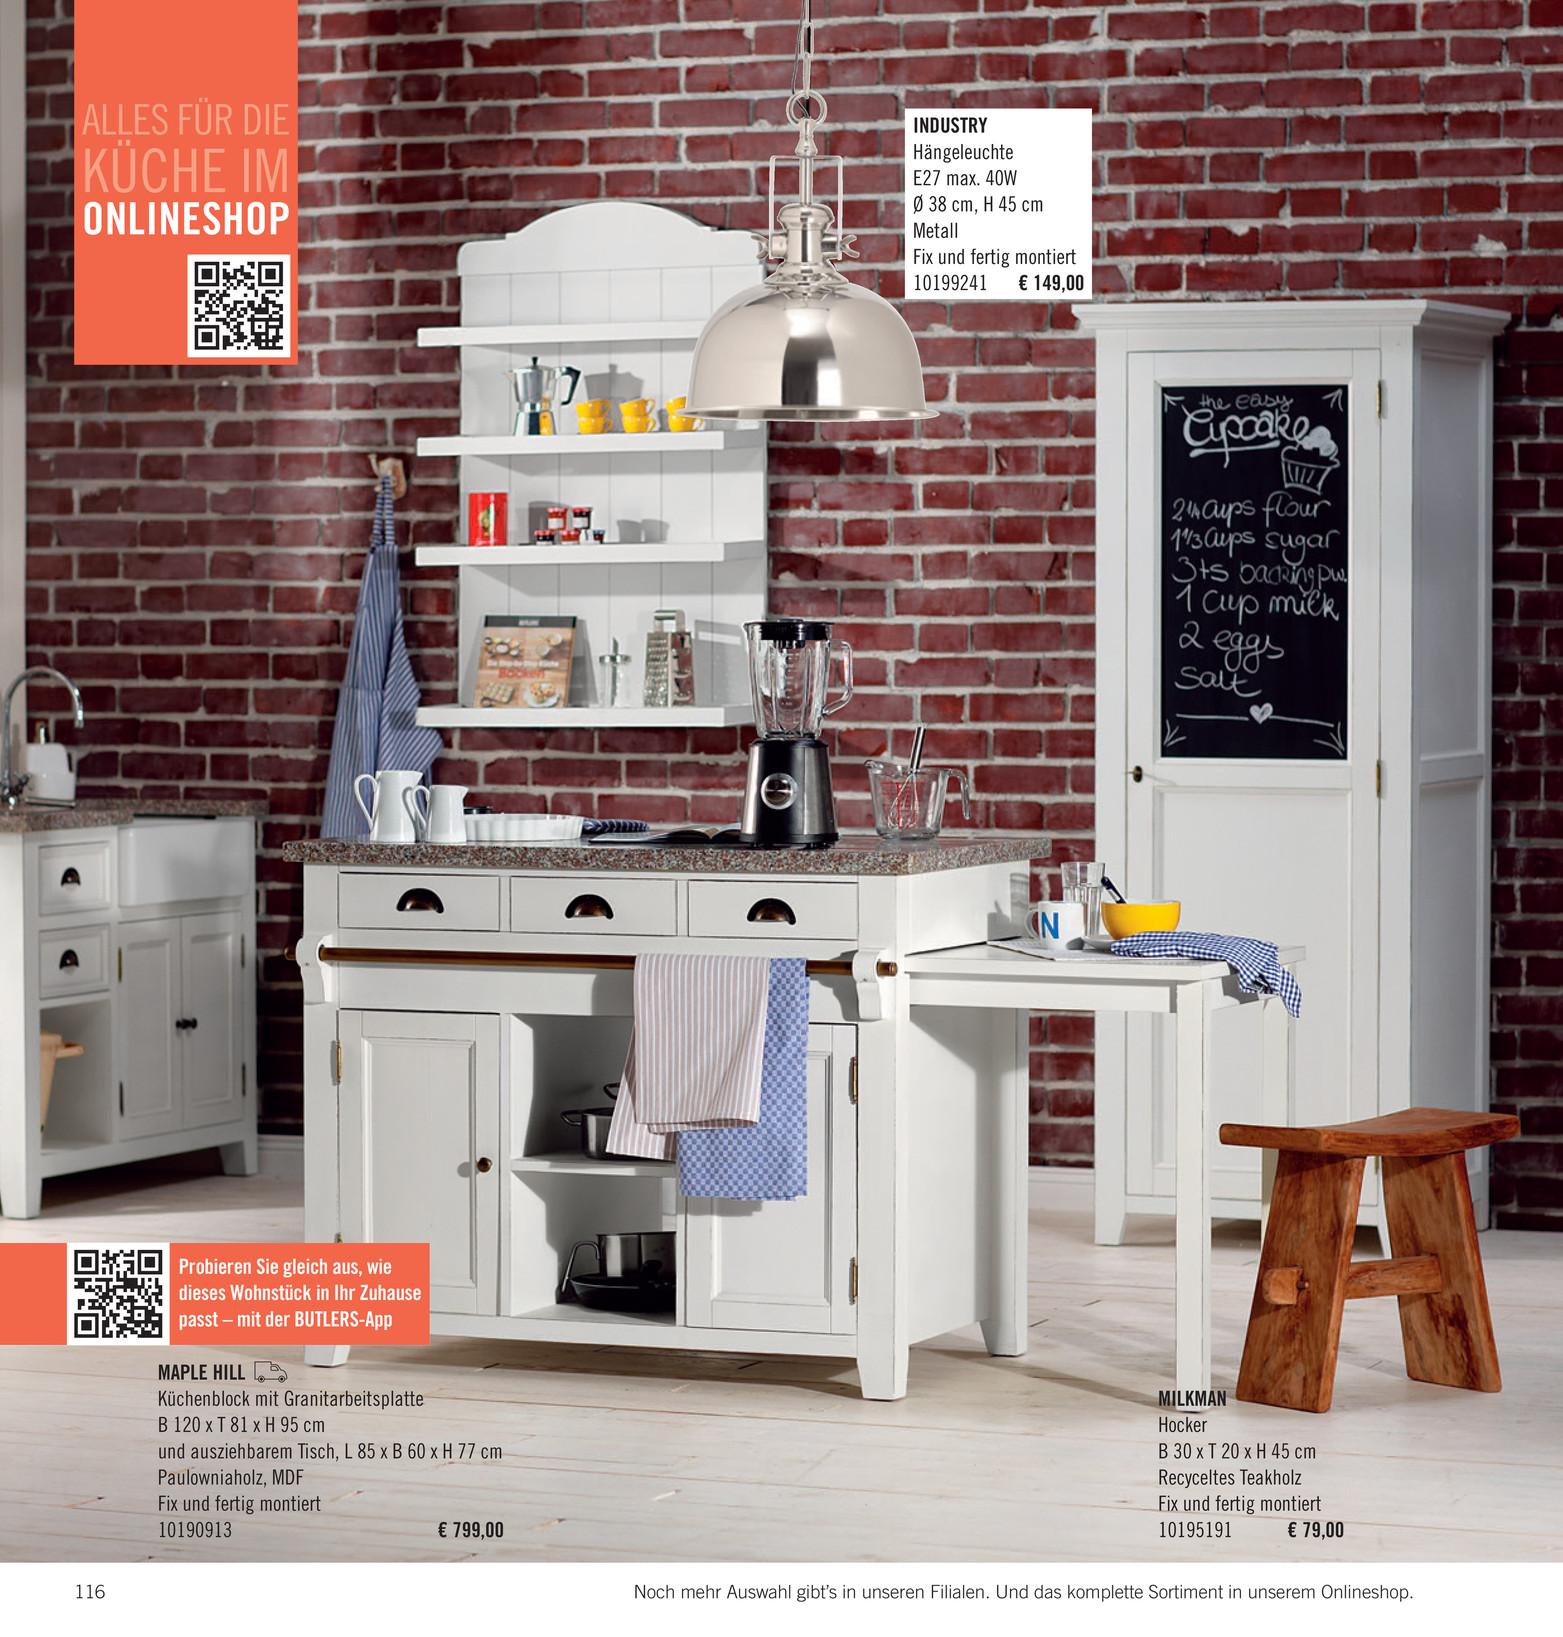 Butlers Katalog De Wohnst Cke Katalog 2014 Seite 116 117